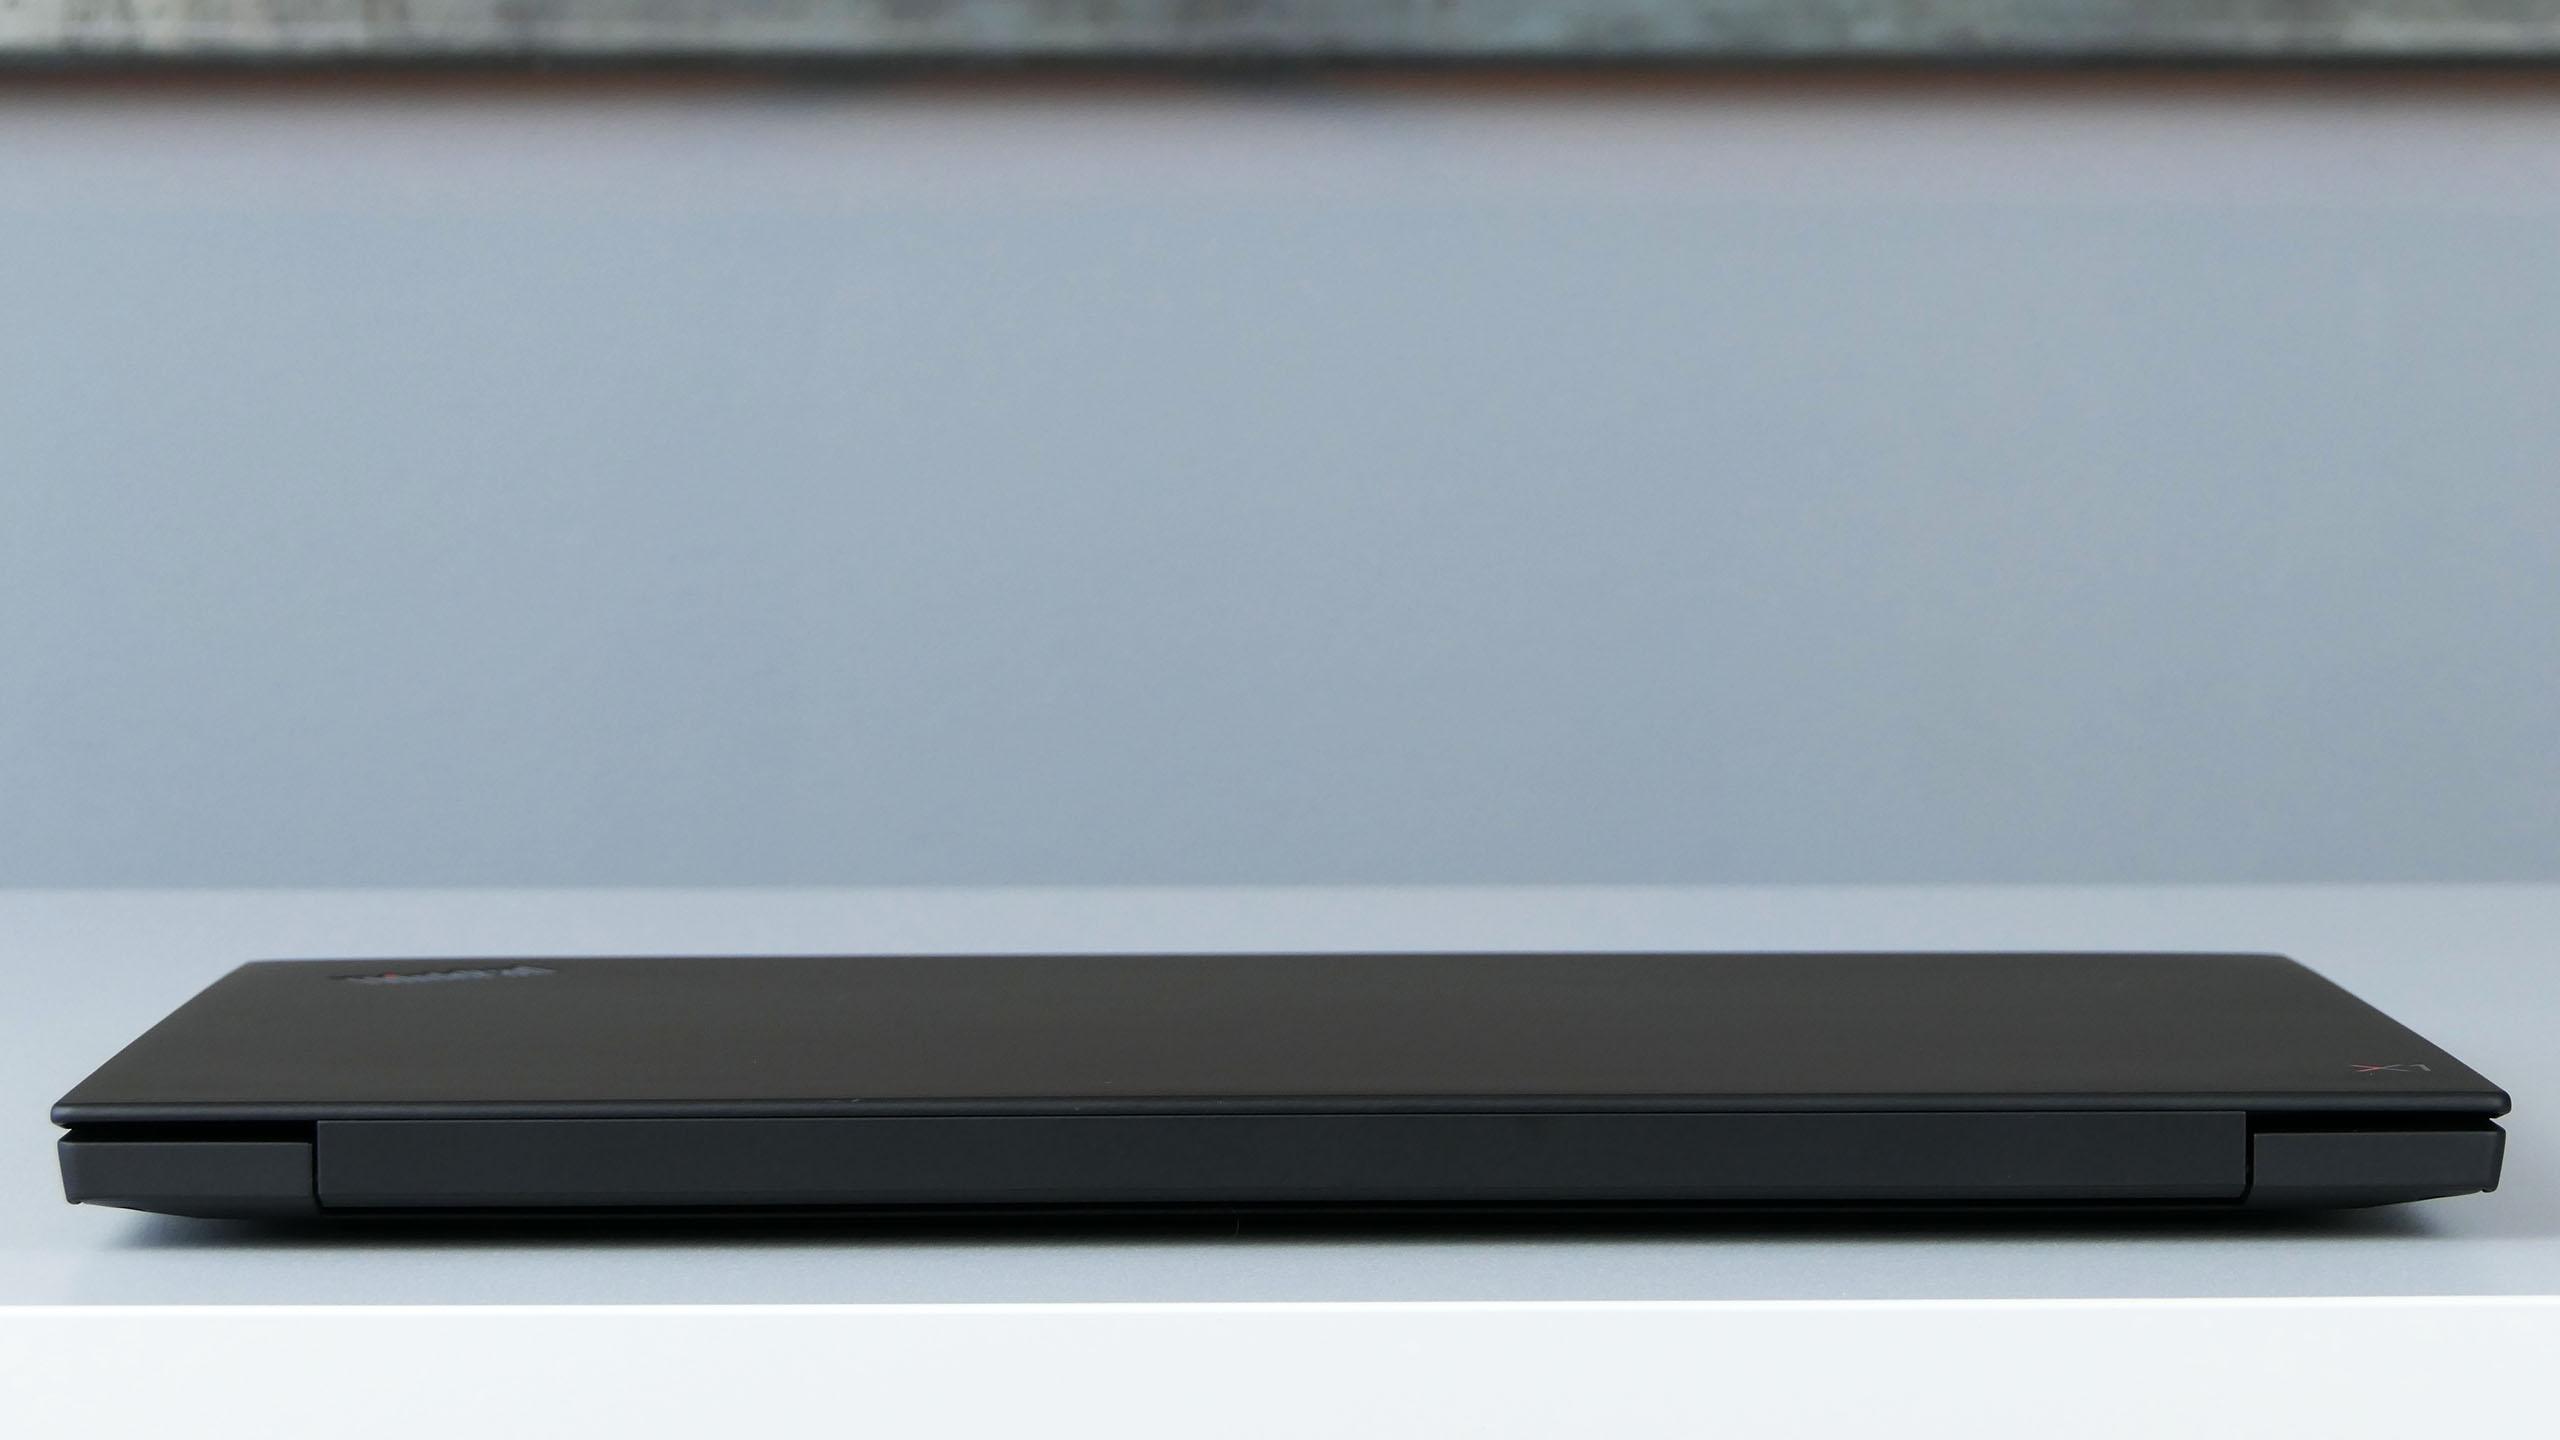 Lenovo ThinkPad X1 Extreme 2nd Gen - tył laptopa